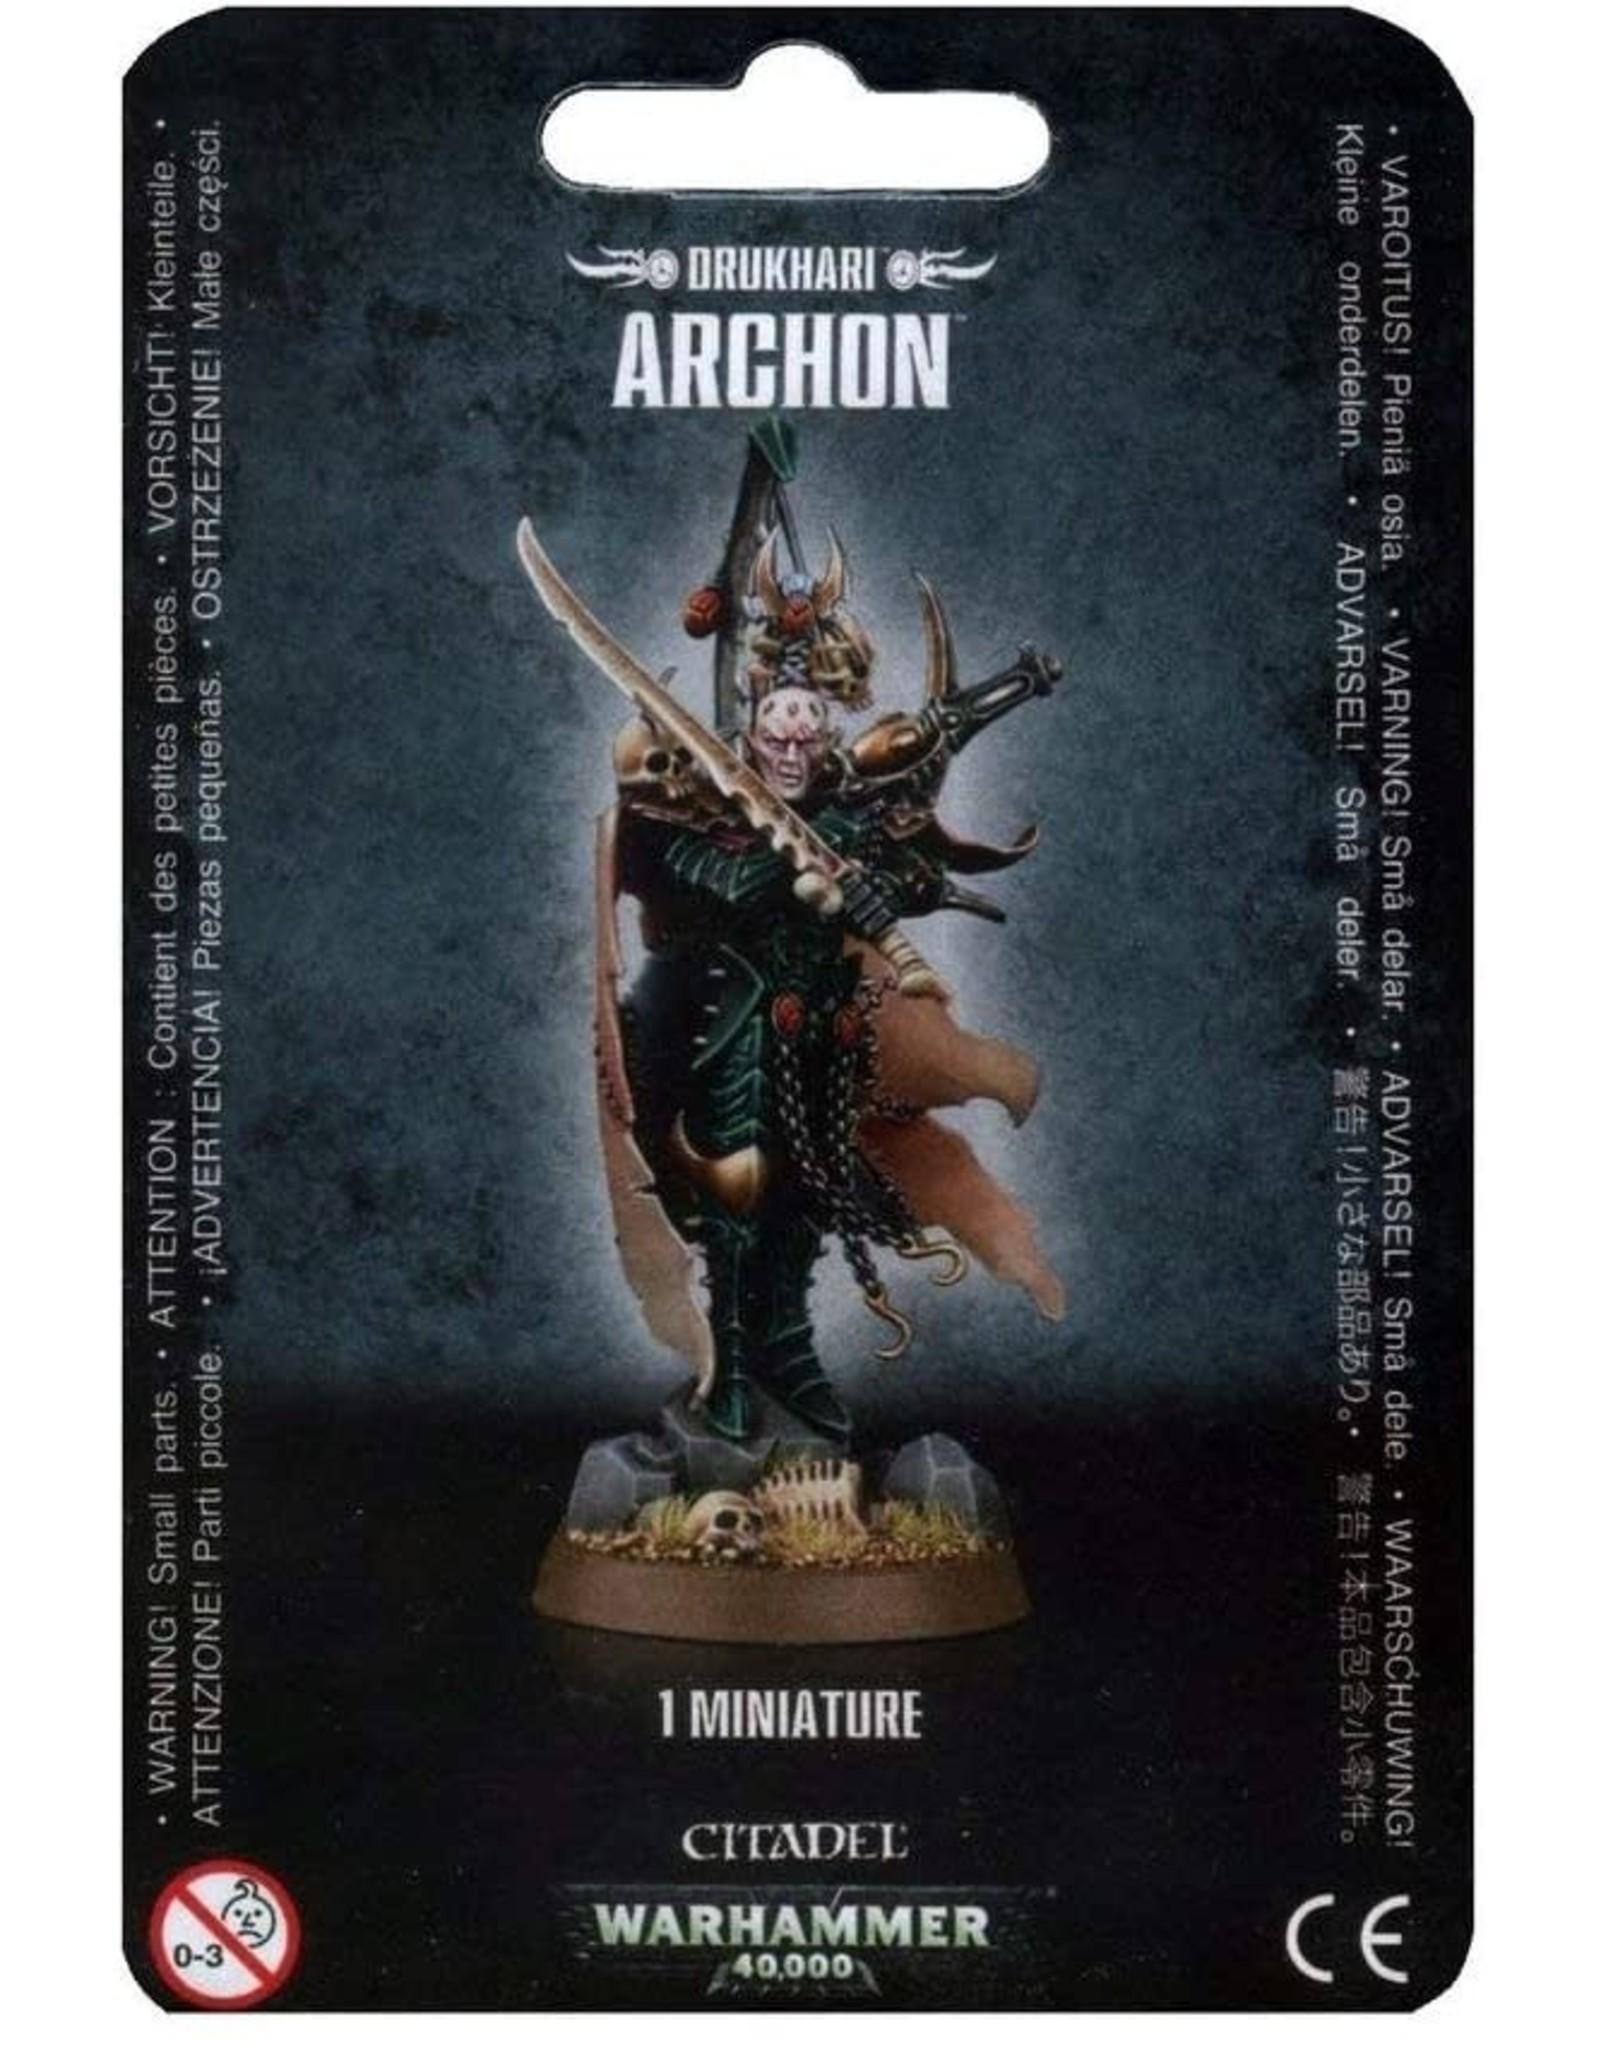 Drukhari Archon (40K)